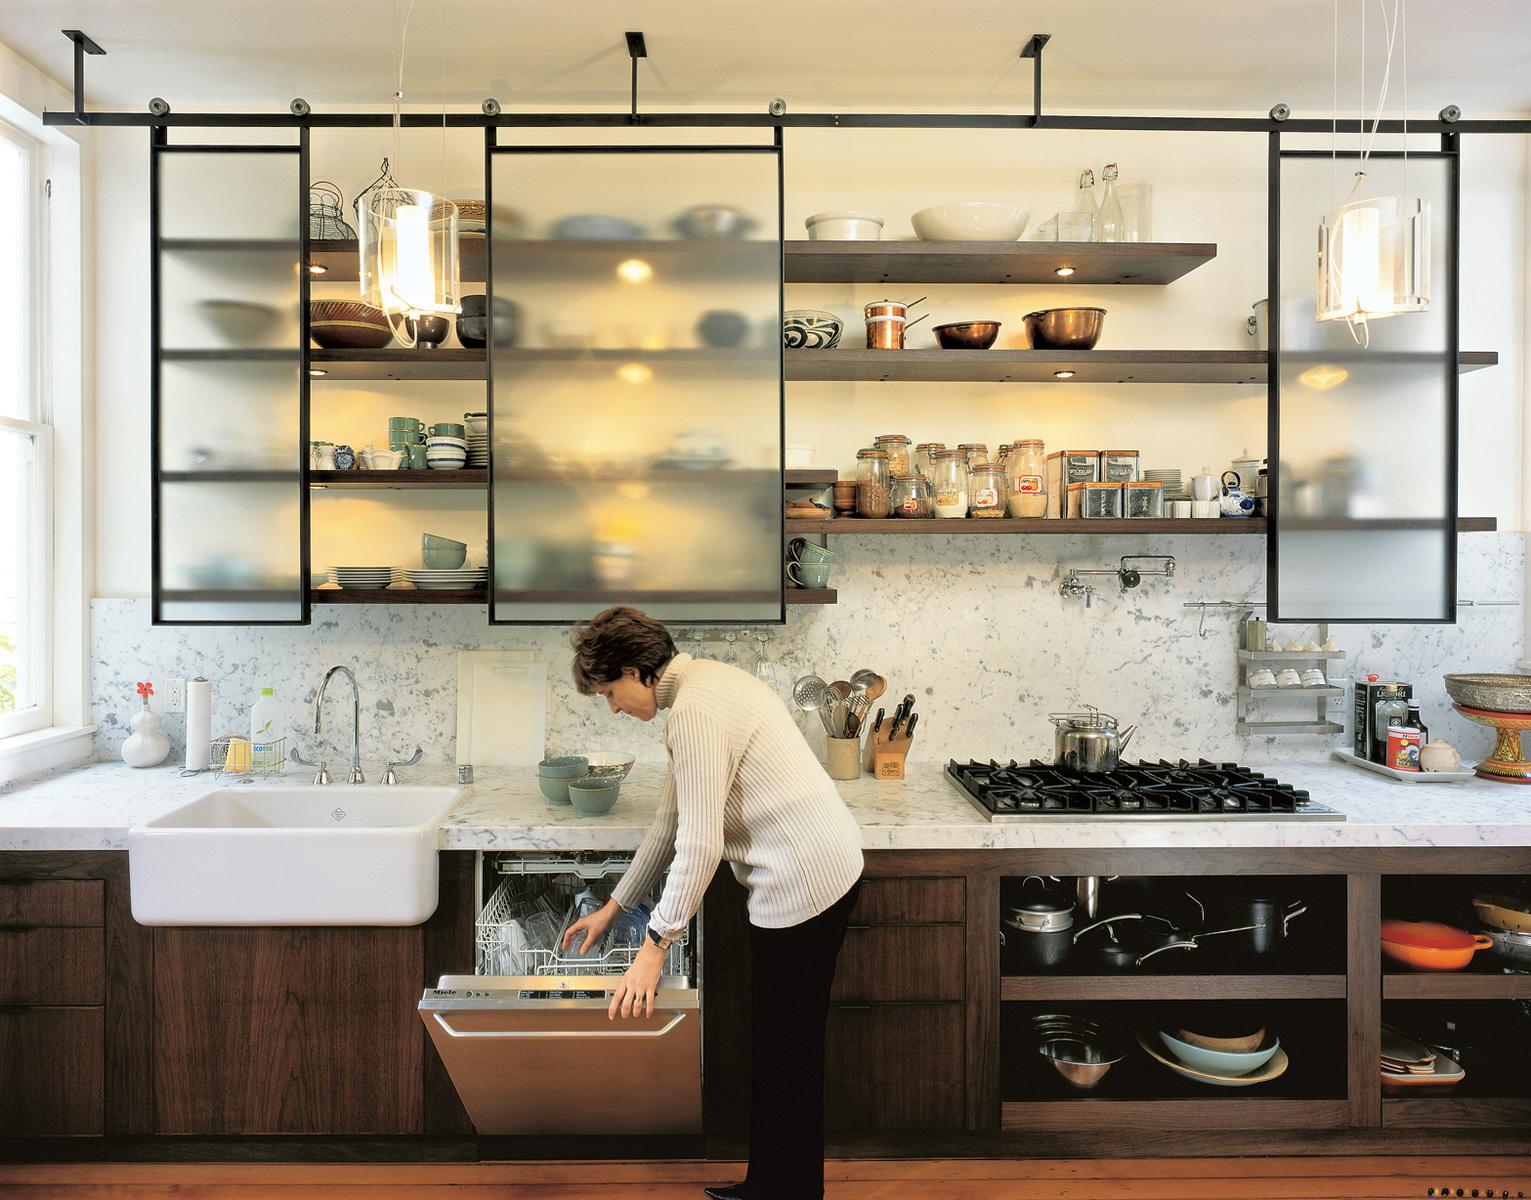 Дизайн кухни идеи для кухни